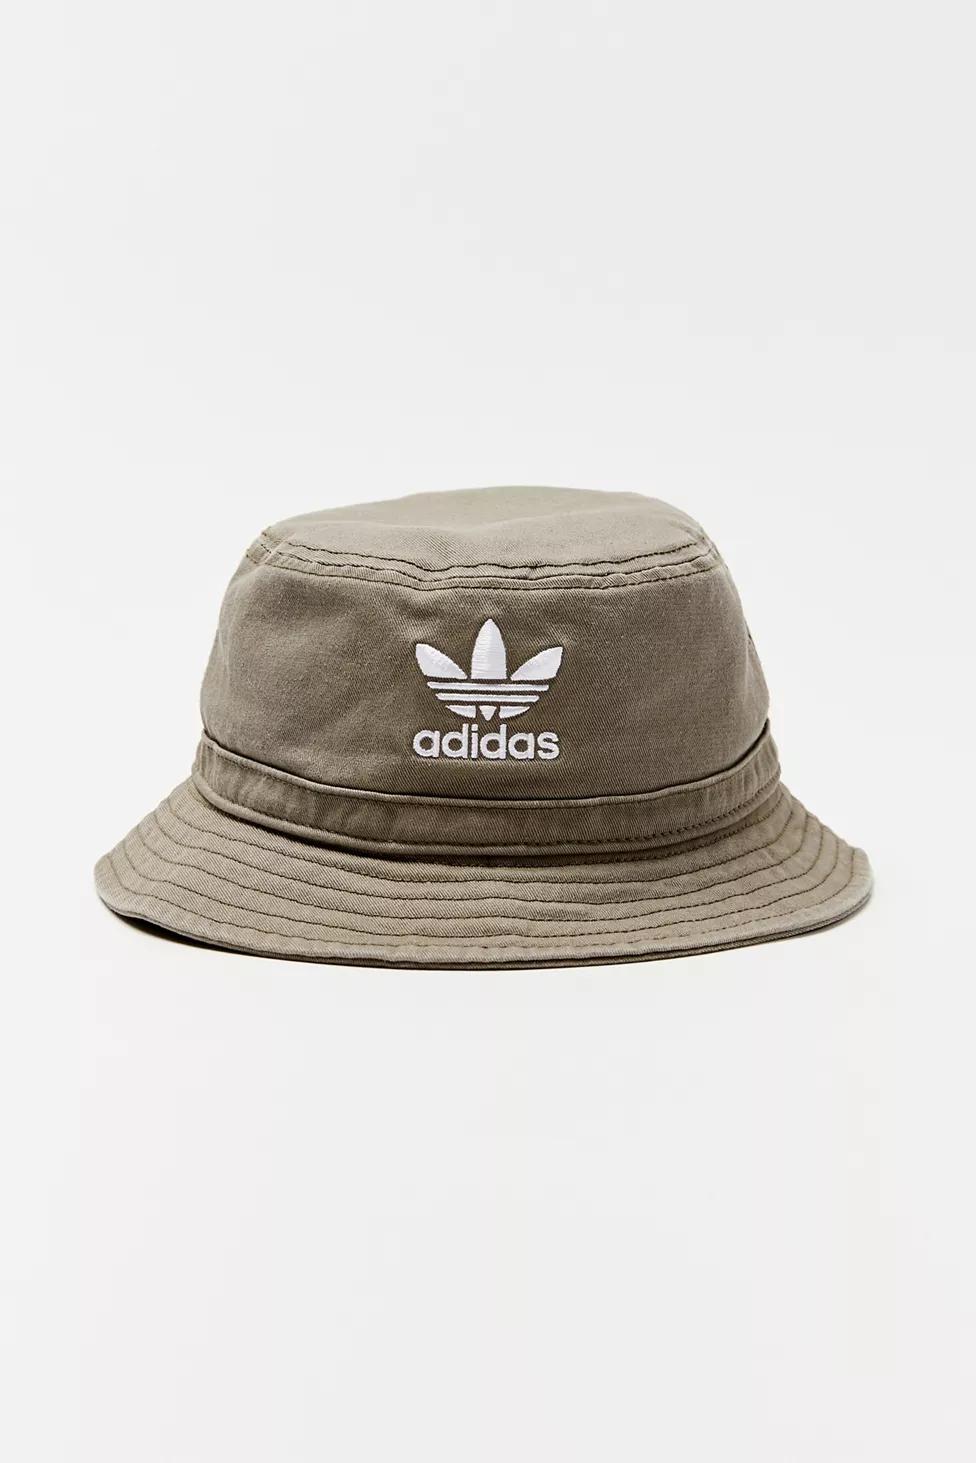 Adidas Originals Denim Bucket Hat In 2021 Adidas Bucket Hat Stussy Bucket Hat Denim Bucket Hat